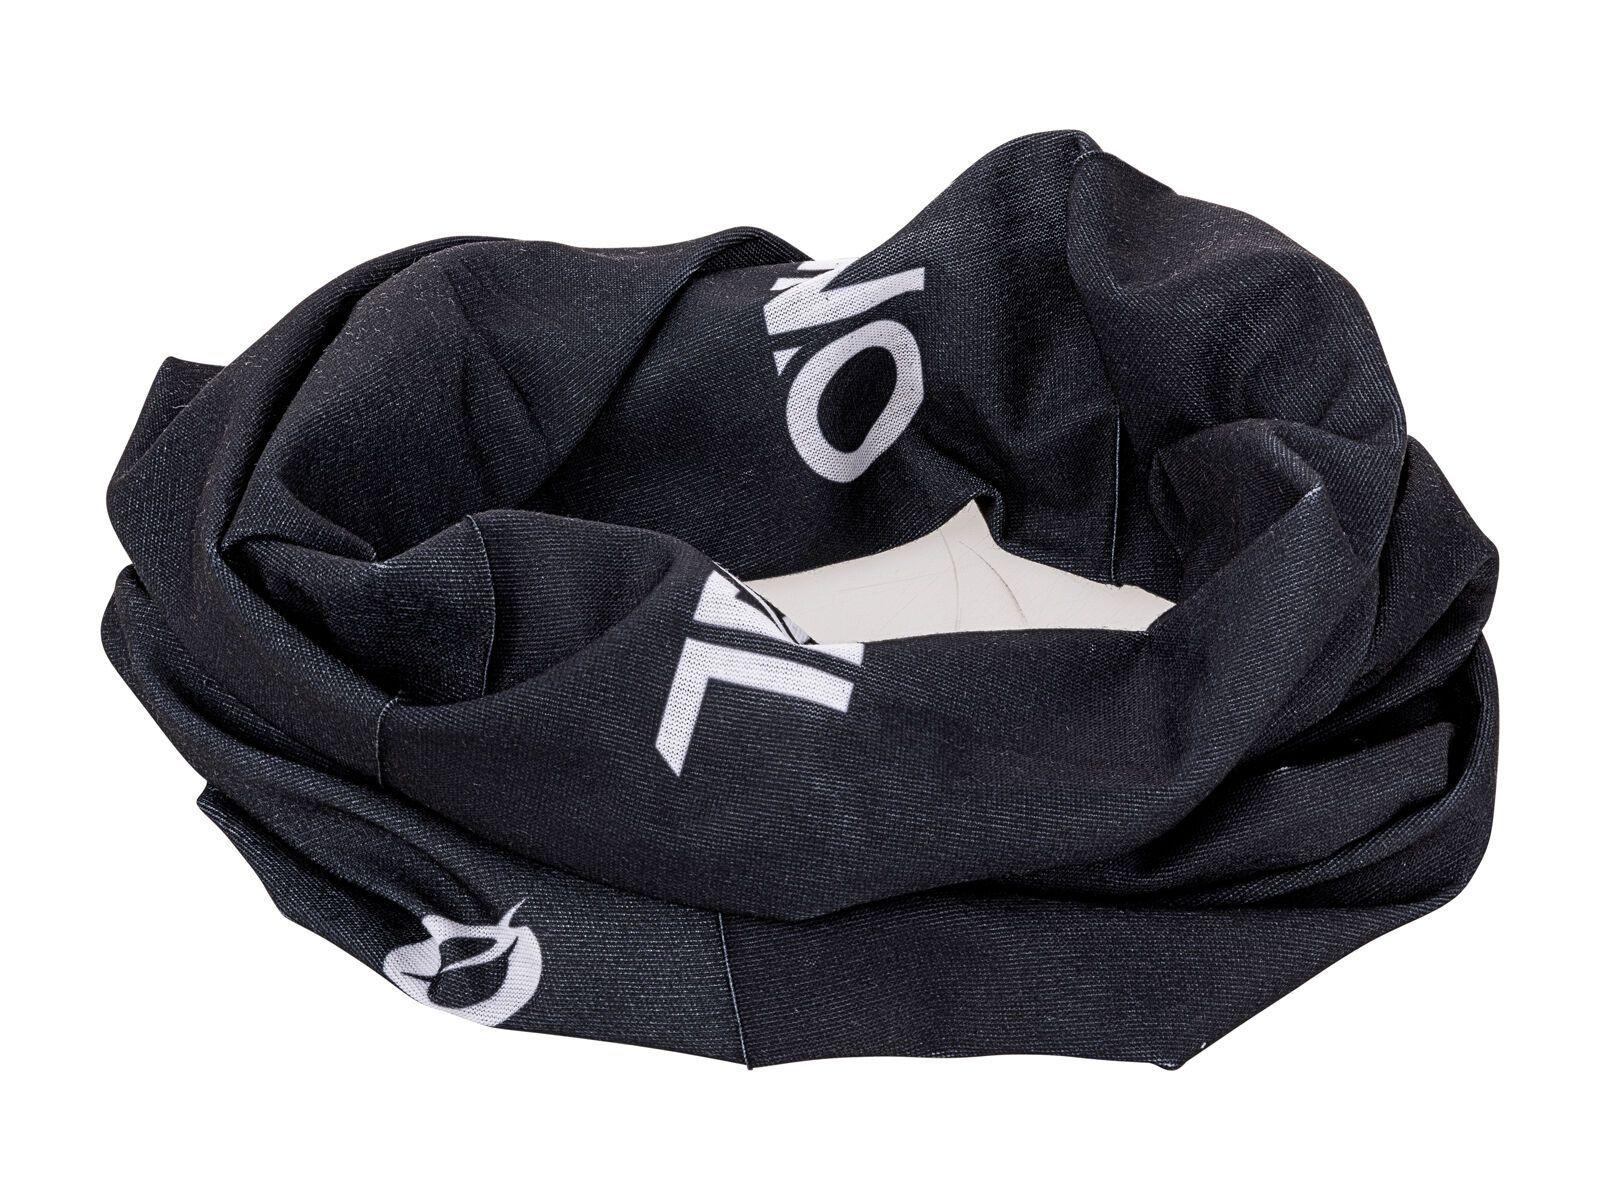 ONeal Neckwarmer Plain black 1024-N04